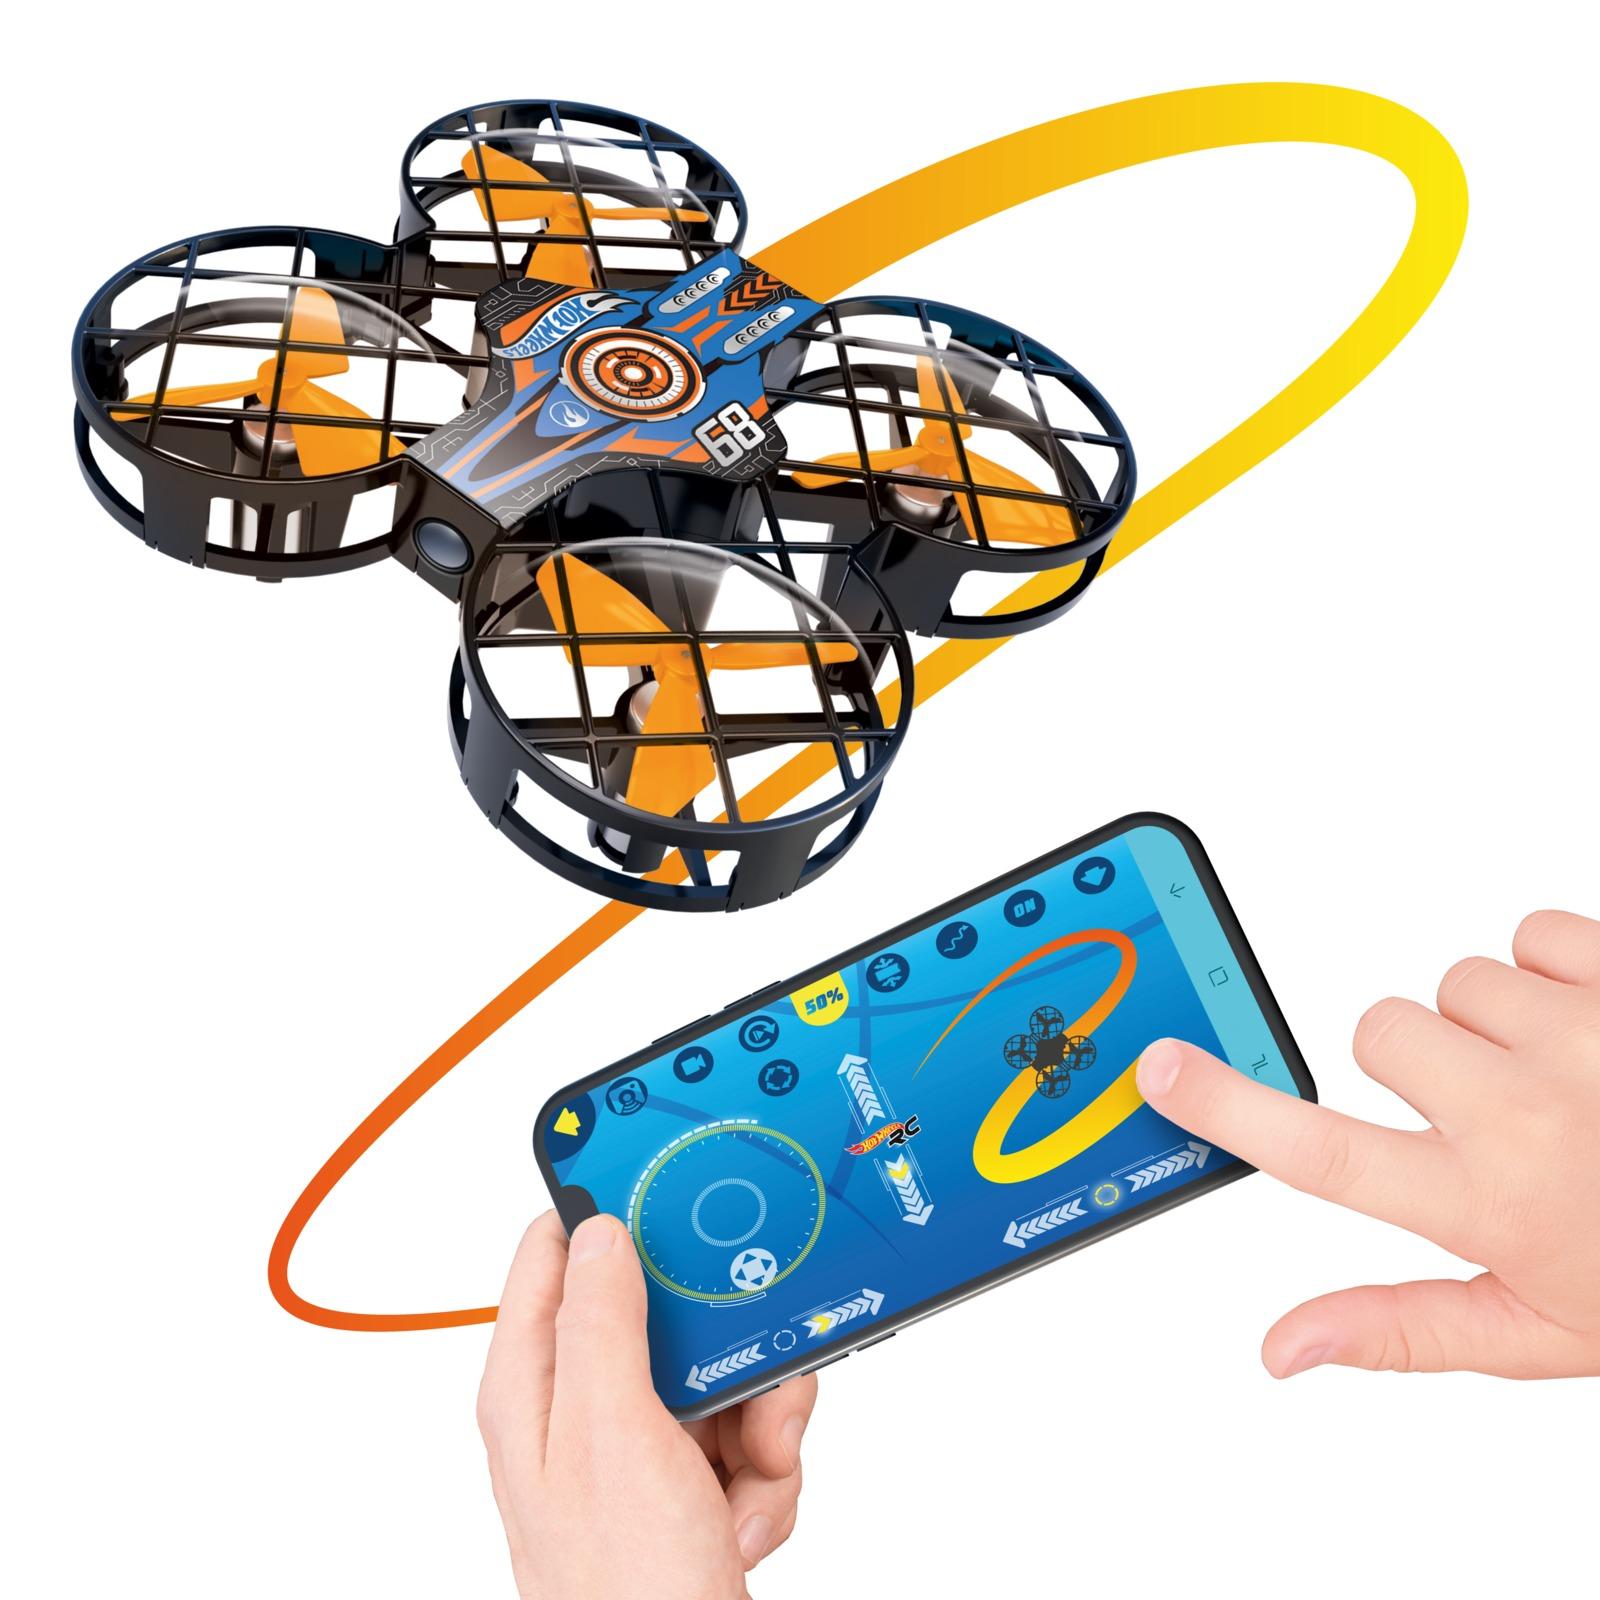 Hot Wheels: Bladez DRX Skytracker - FPV Racing Drone image